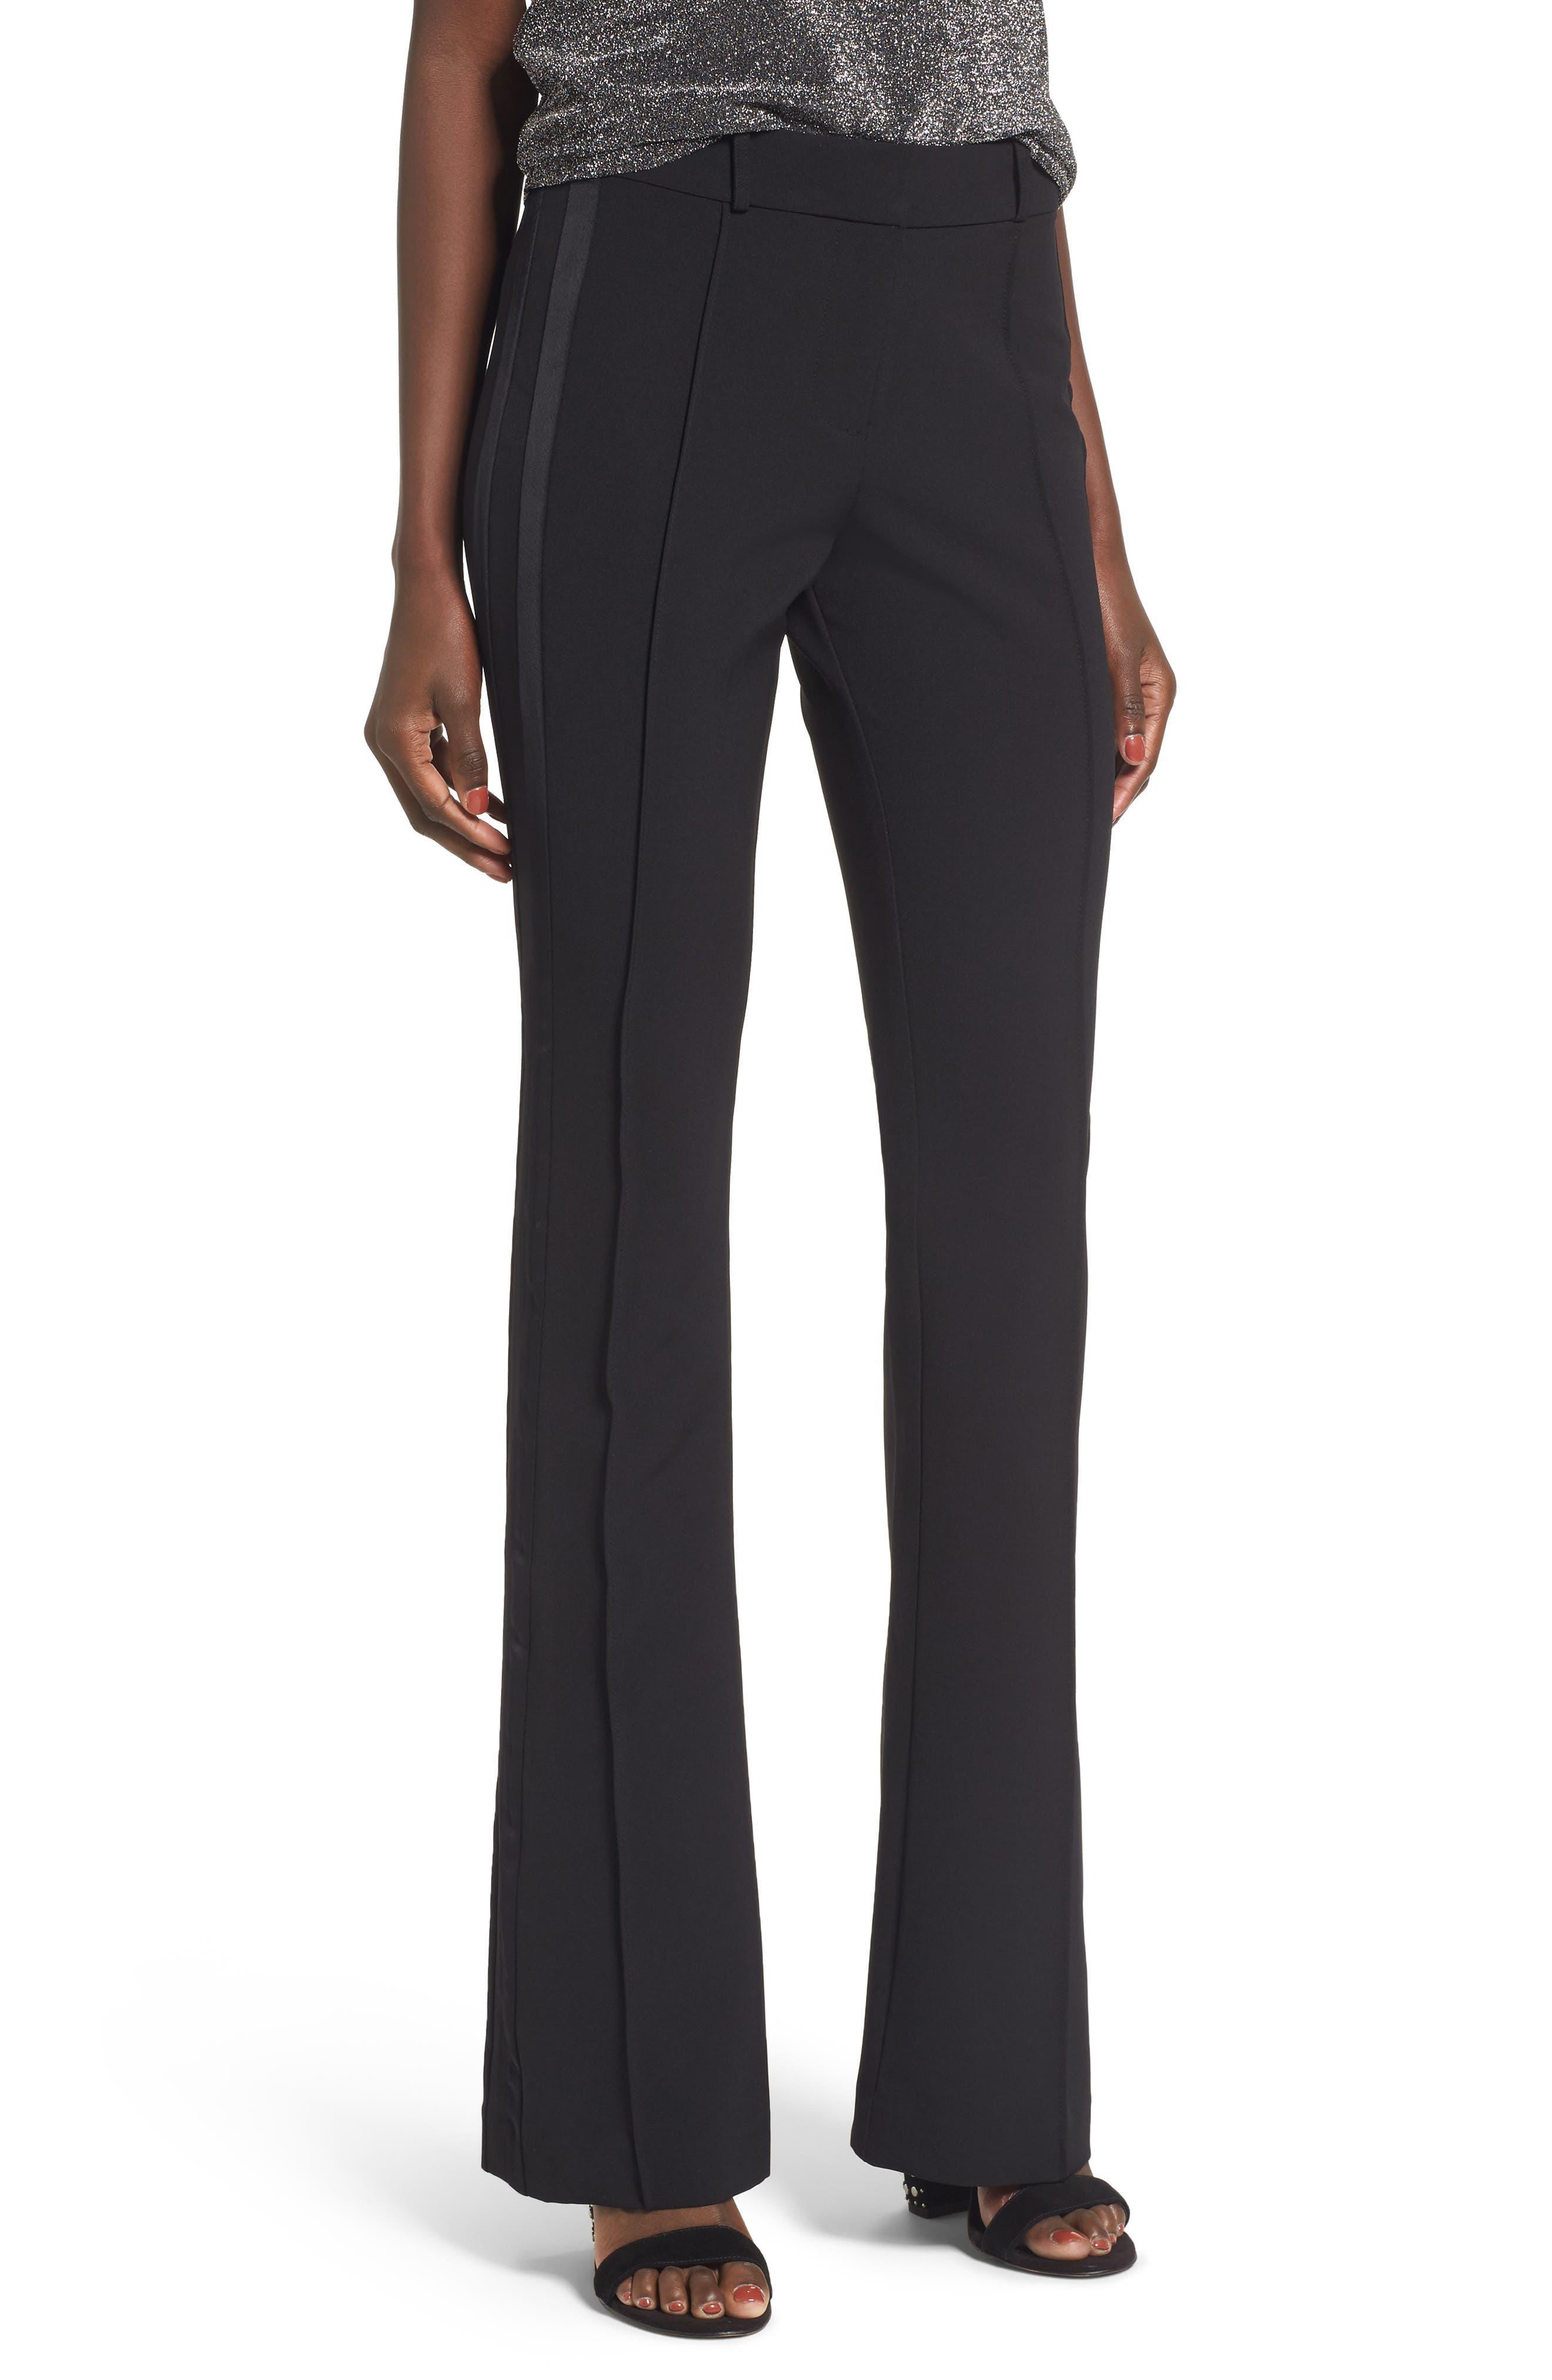 Roxy Flare Leg Pants,                             Main thumbnail 1, color,                             Black